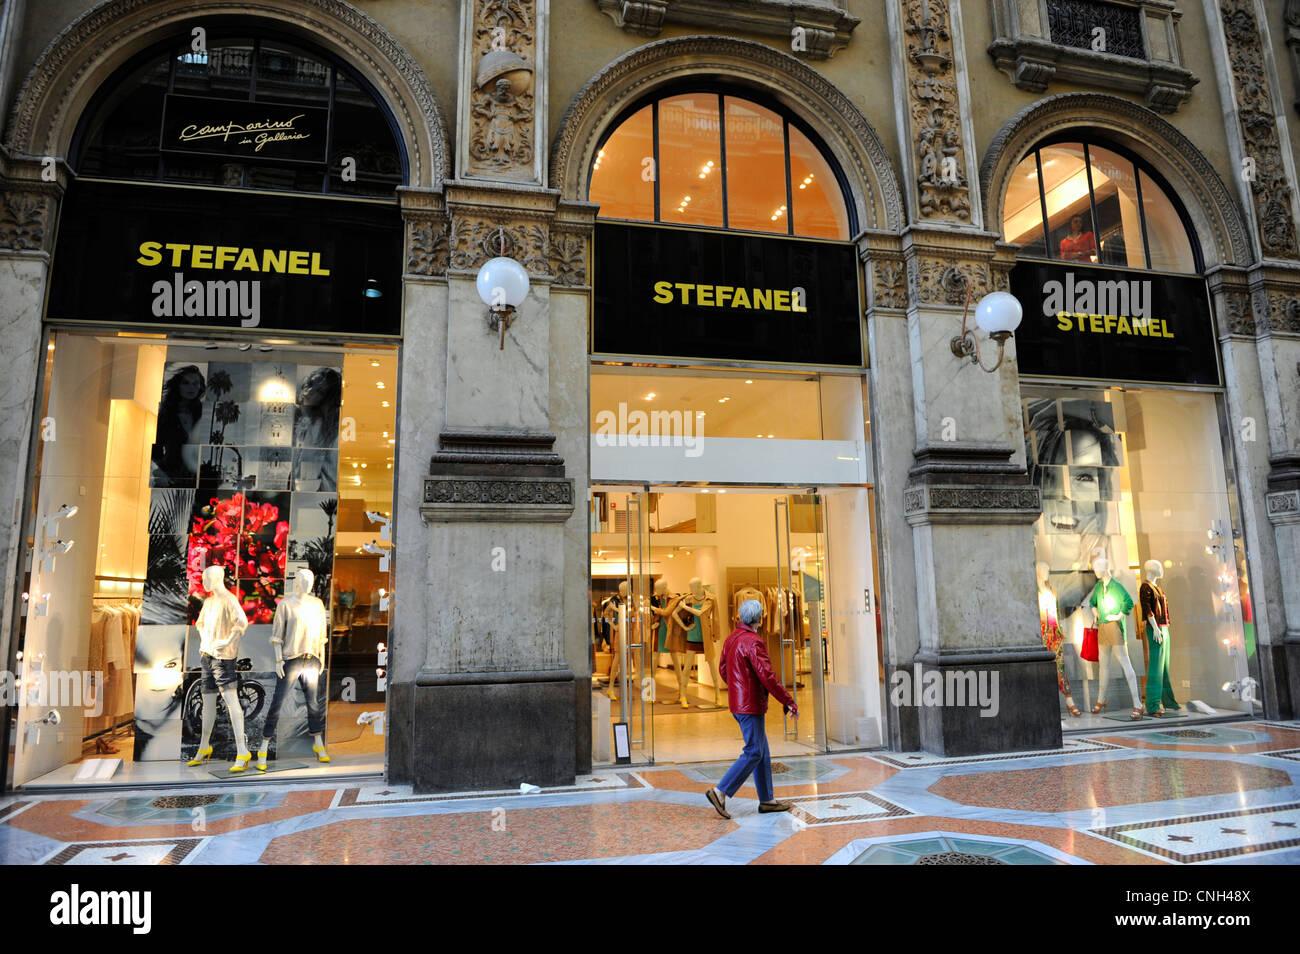 Stefanel shop. Galleria Vittorio Emanuele II. Milano Italy - Stock Image